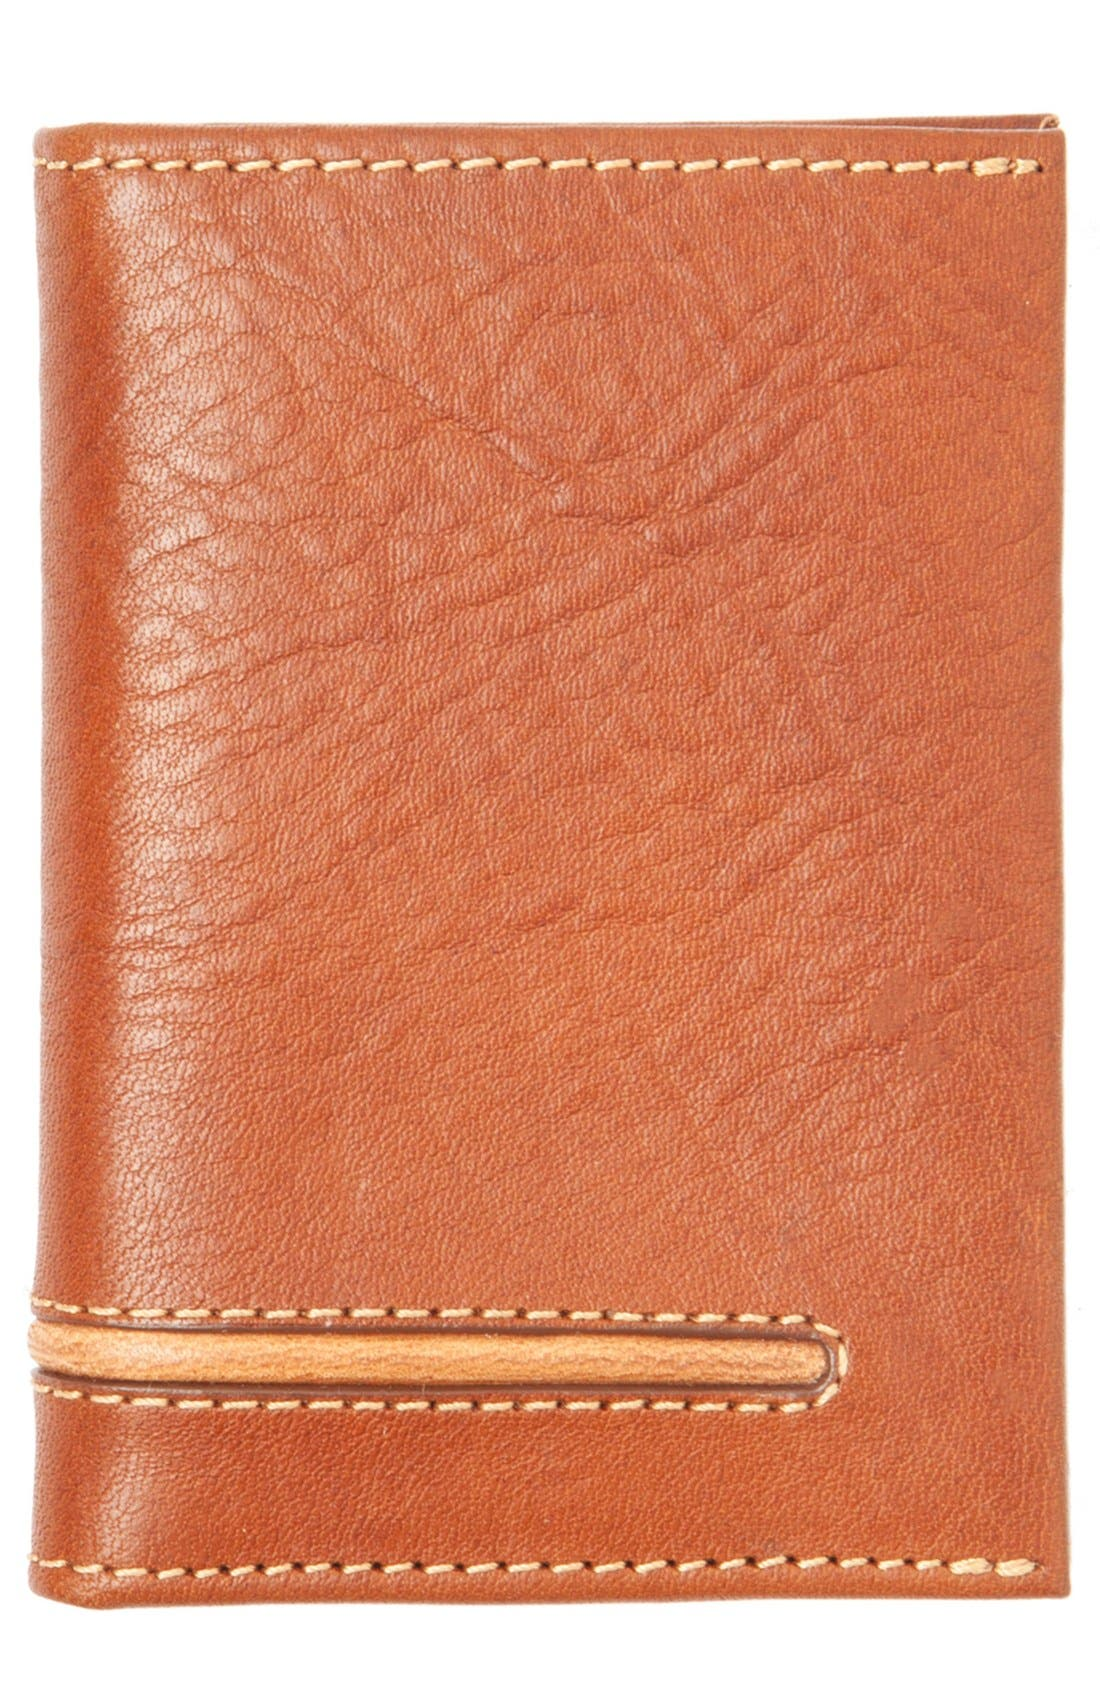 Leather Money Clip Card Case,                         Main,                         color, 200